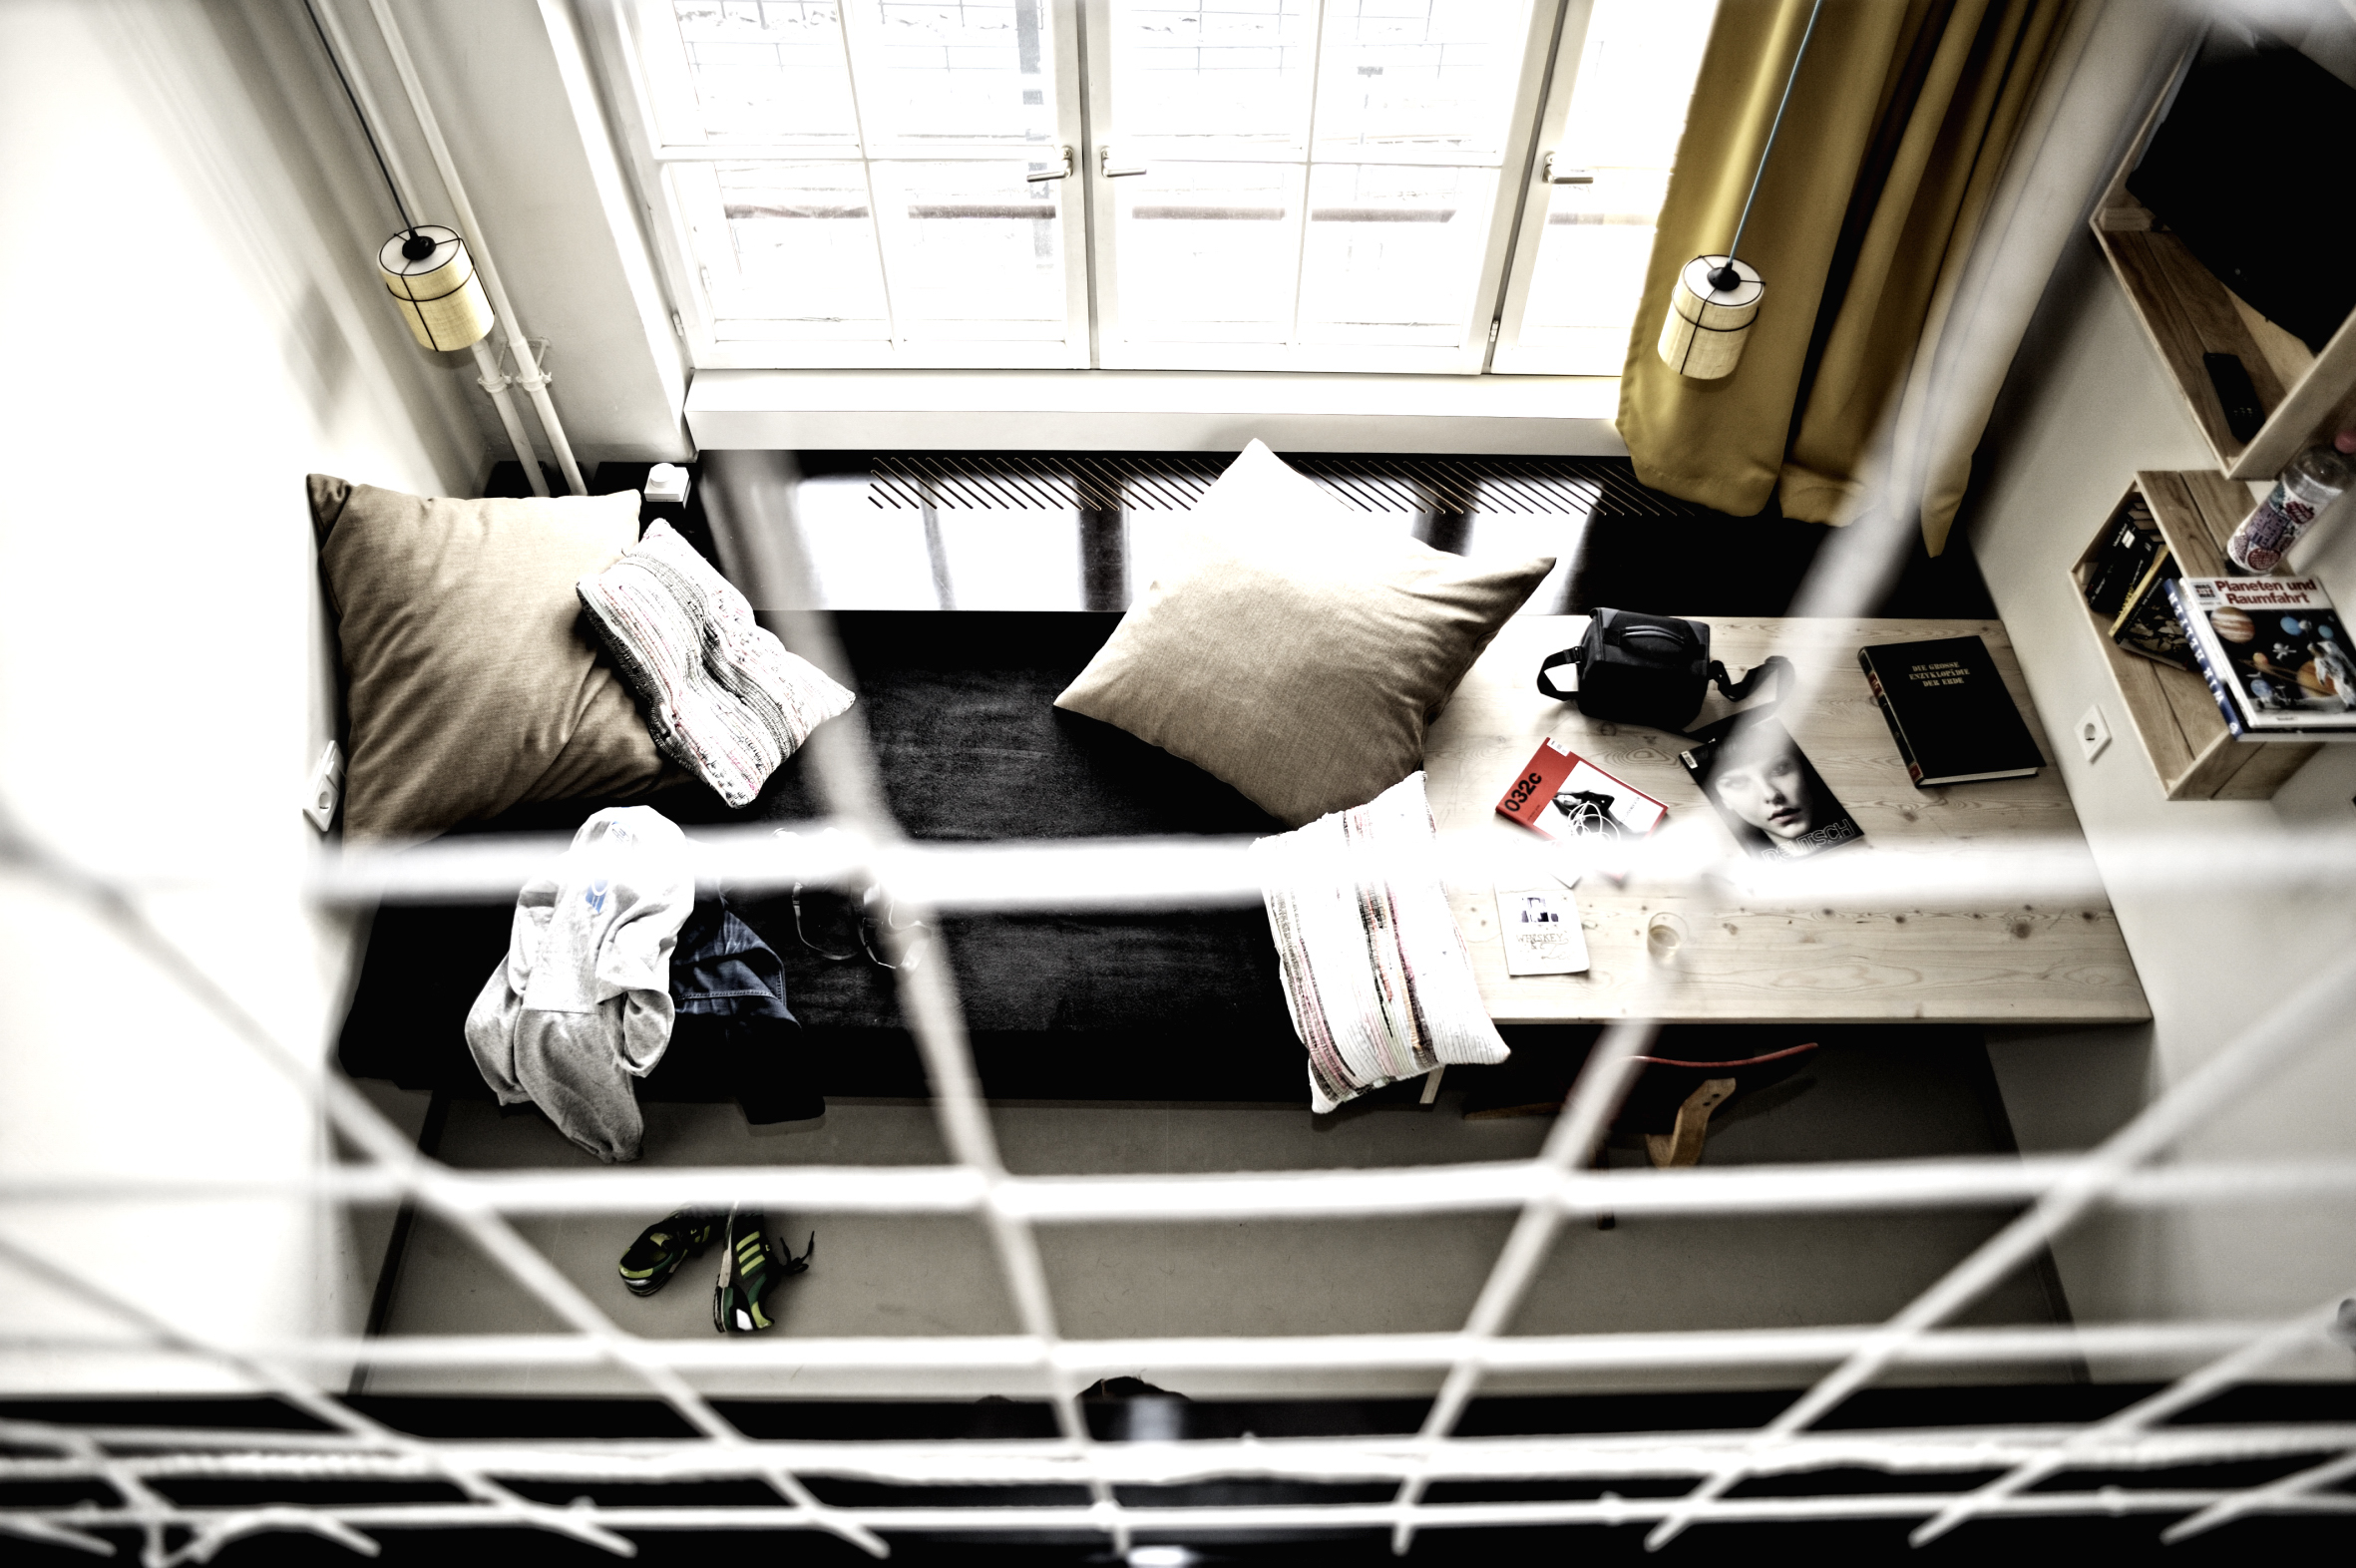 michelberger h tel berlin. Black Bedroom Furniture Sets. Home Design Ideas